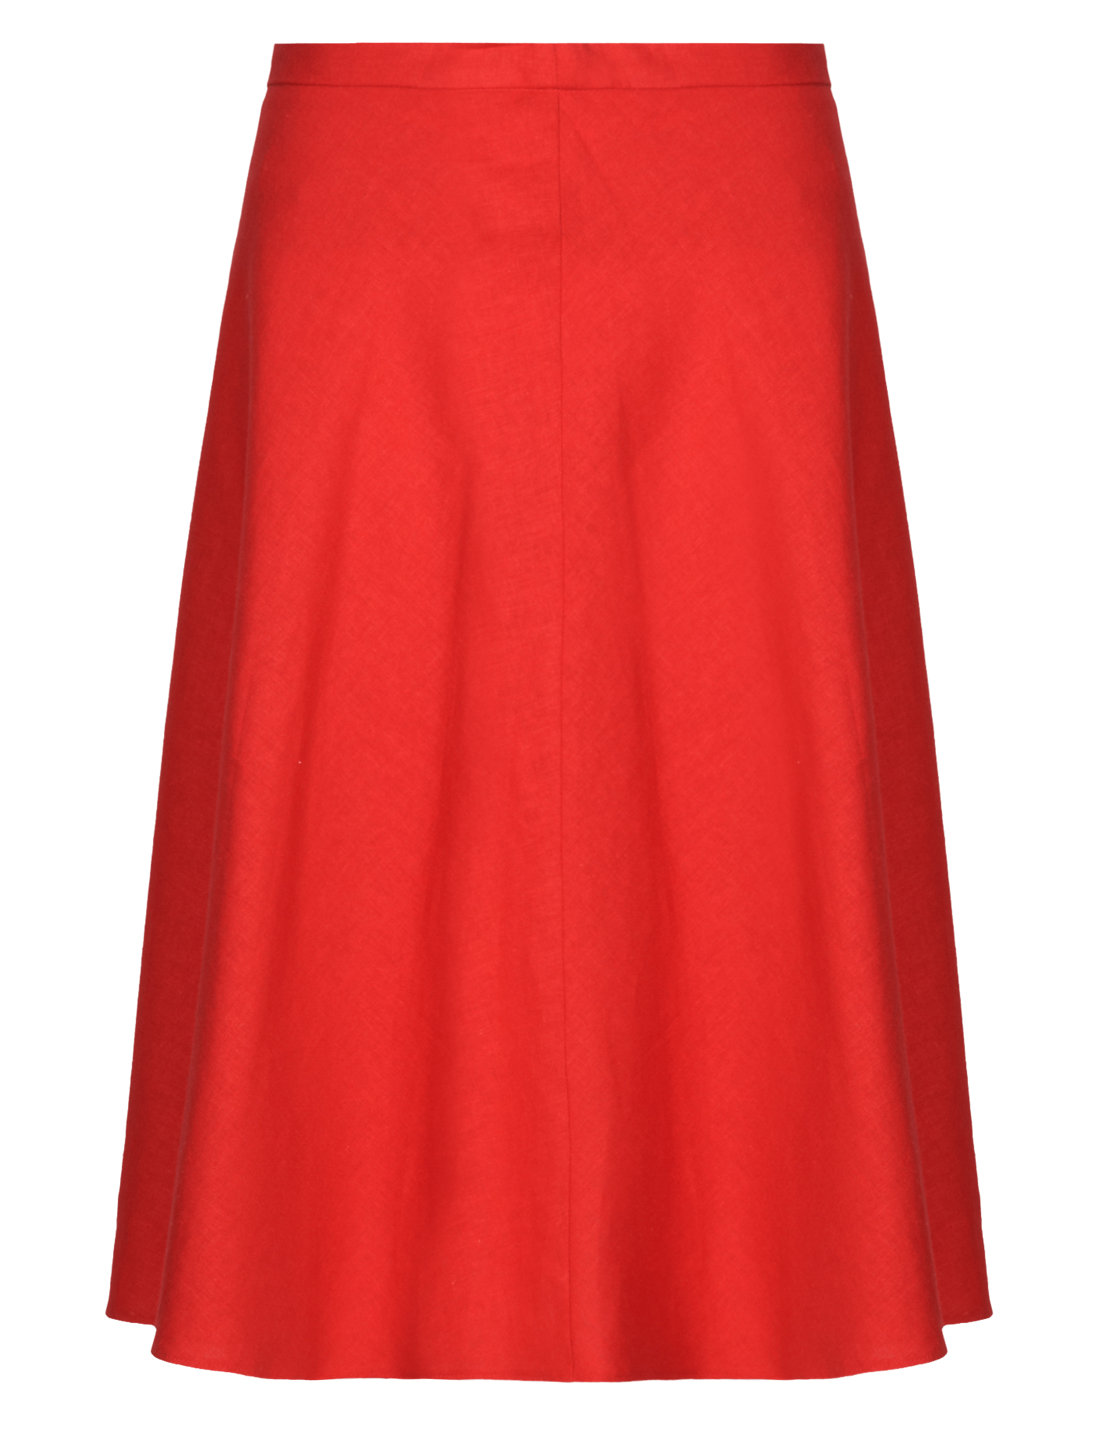 Panelled Knee Length A-Line Skirt | M&S